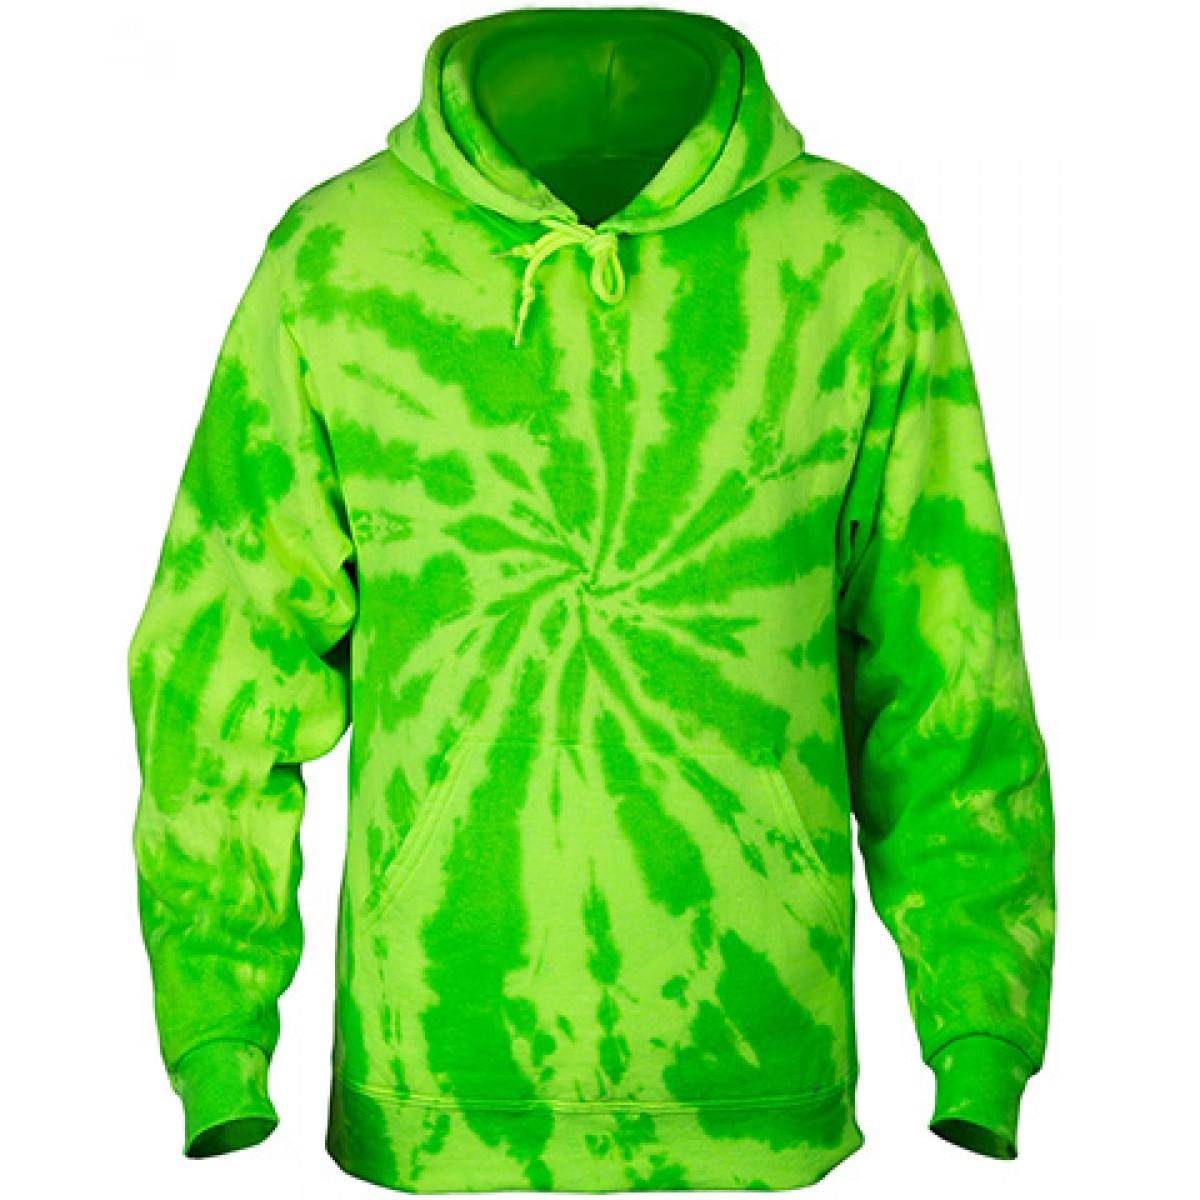 Tie-Dye Pullover Hooded Sweatshirt-Neon Green-S